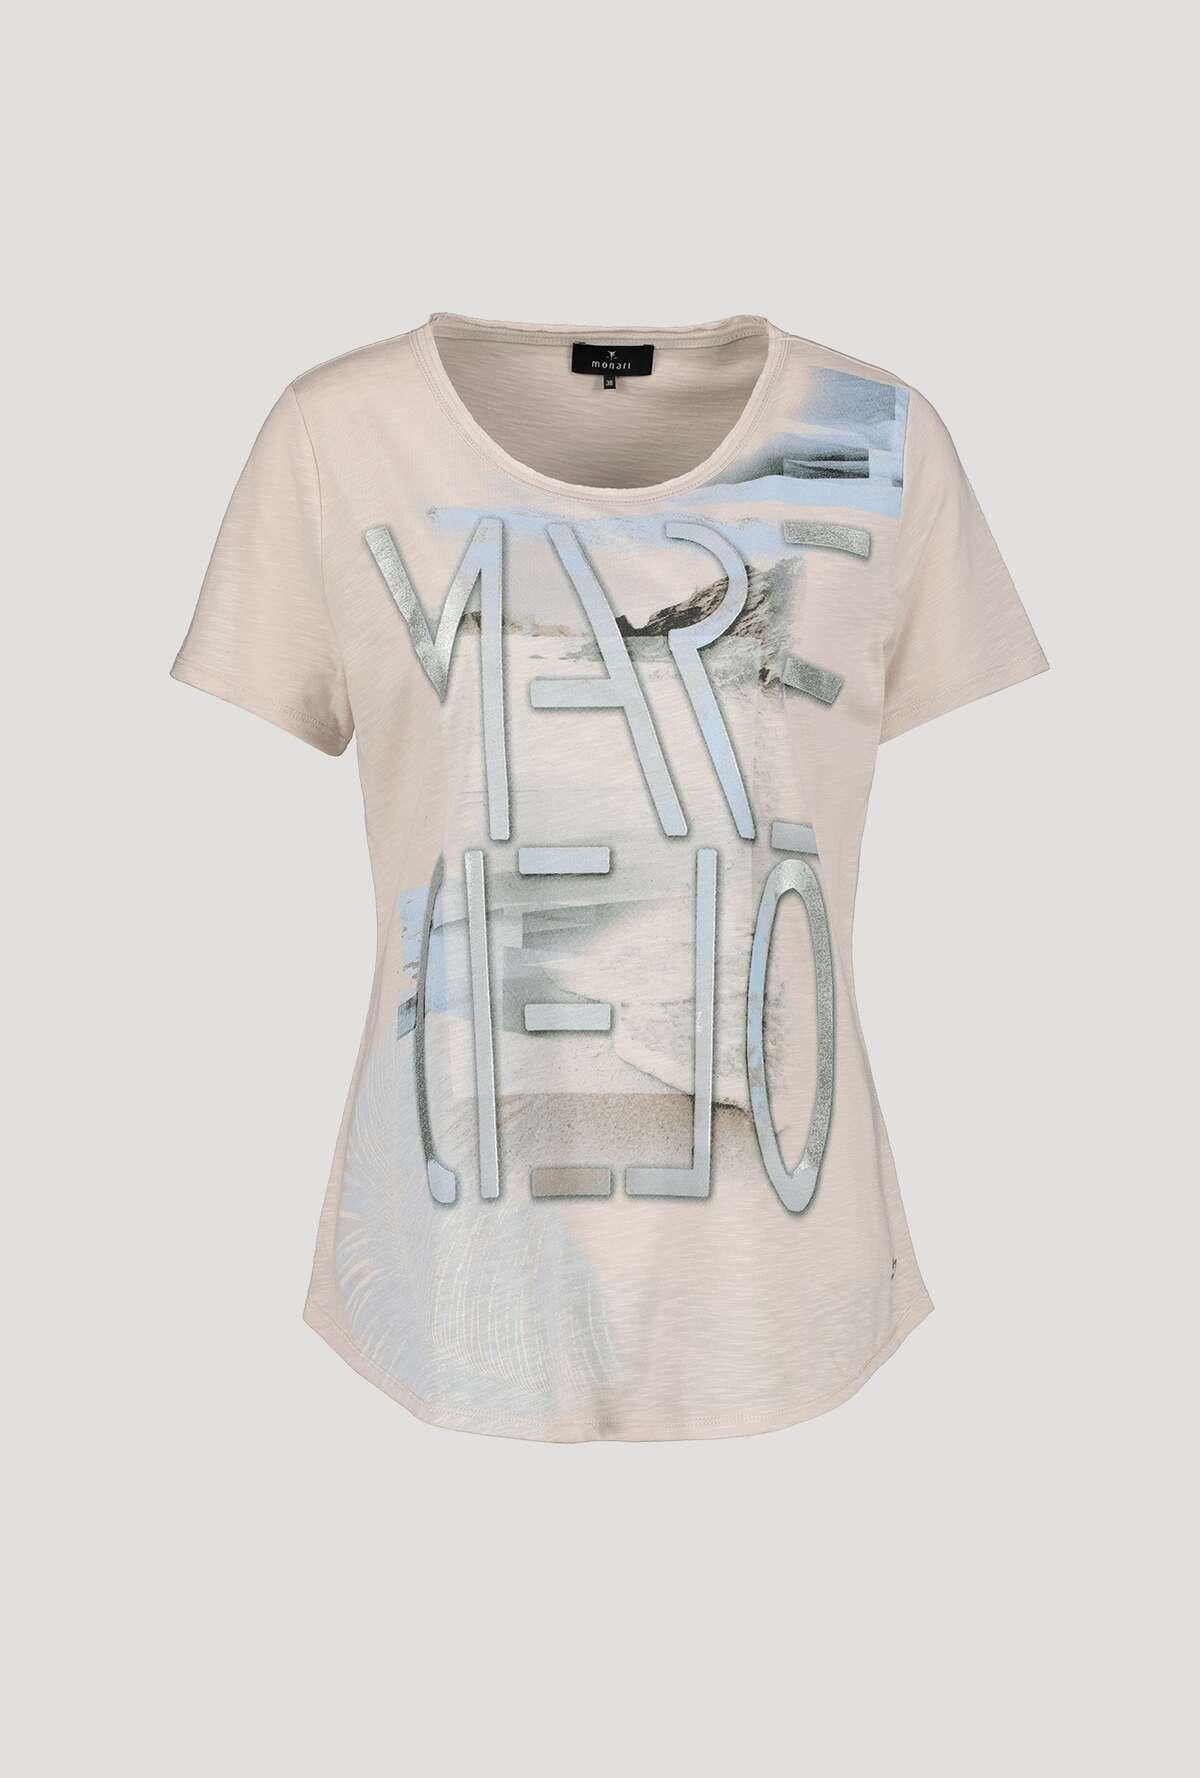 Monari Shirt Cape Town Mare